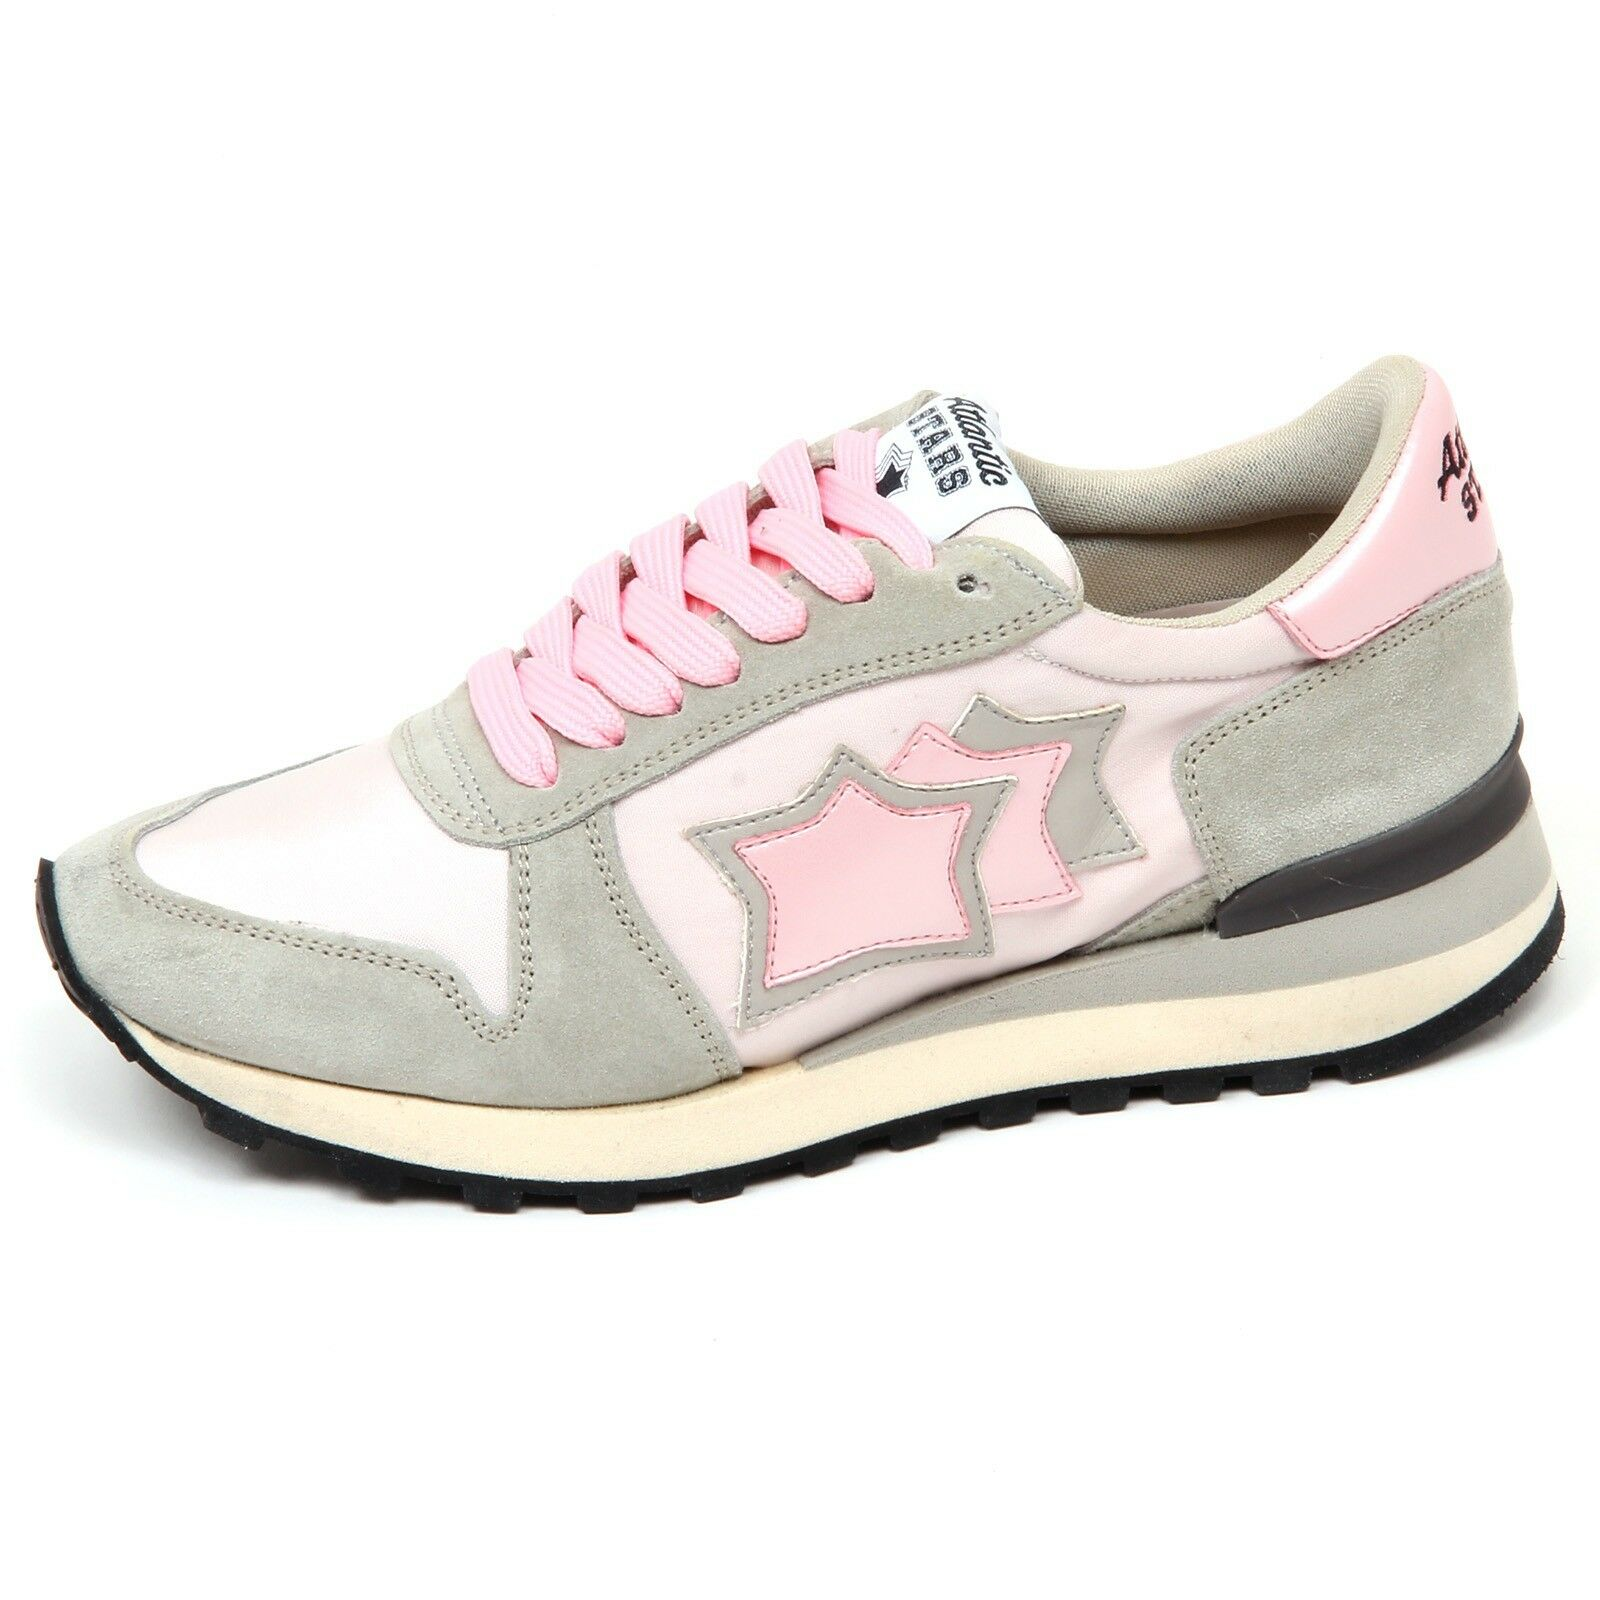 E9404 cortos mujer (no Box) Box) Box) Atlantic Stars Alhena zapatos zapatos Woman  descuento online